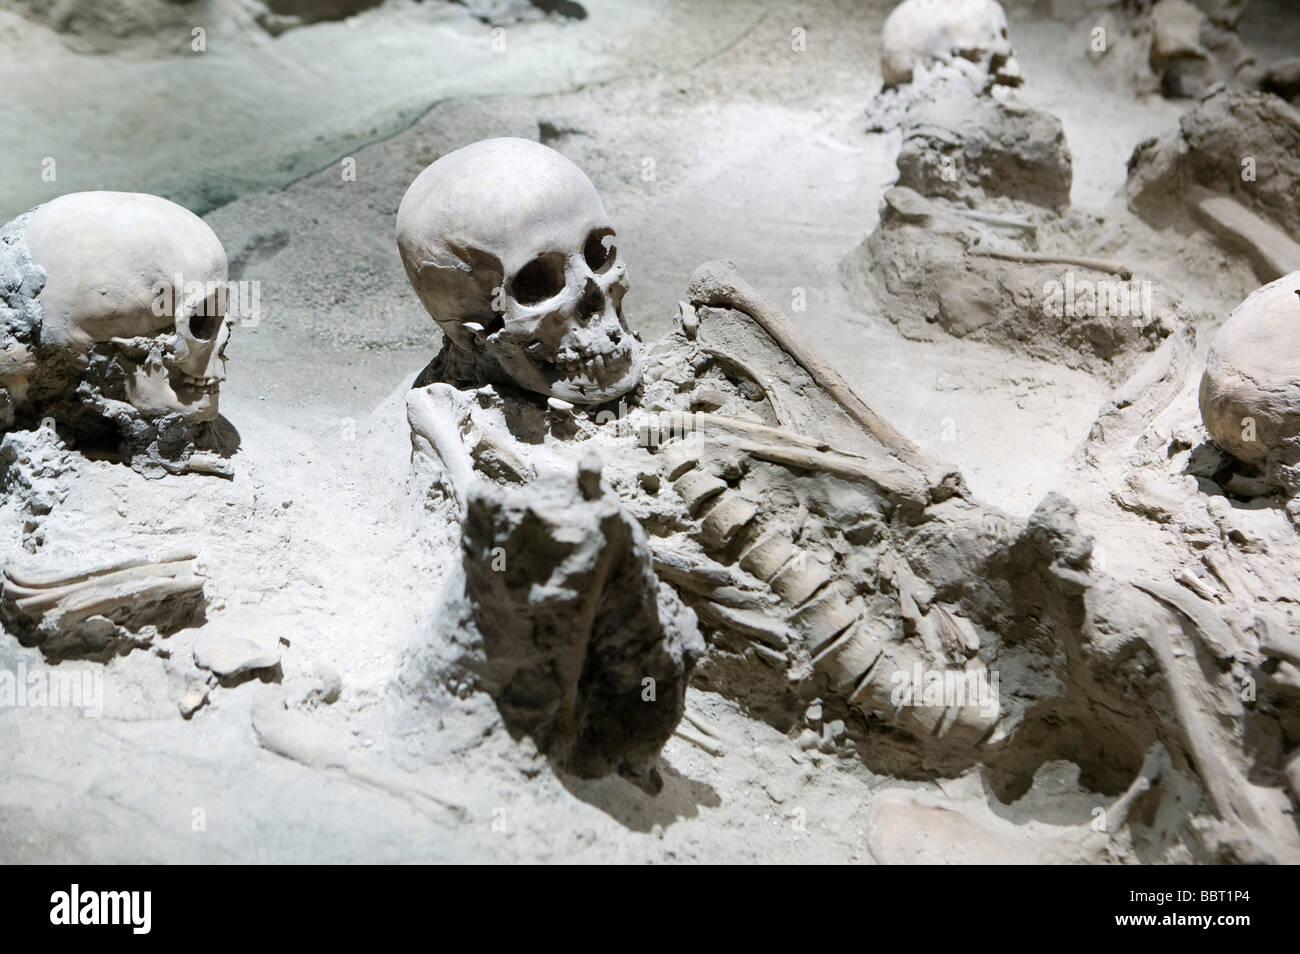 victim human skeleton Herculano Vesubio Naples Italy museum recreation atracttion representation disaster dead volcano - Stock Image